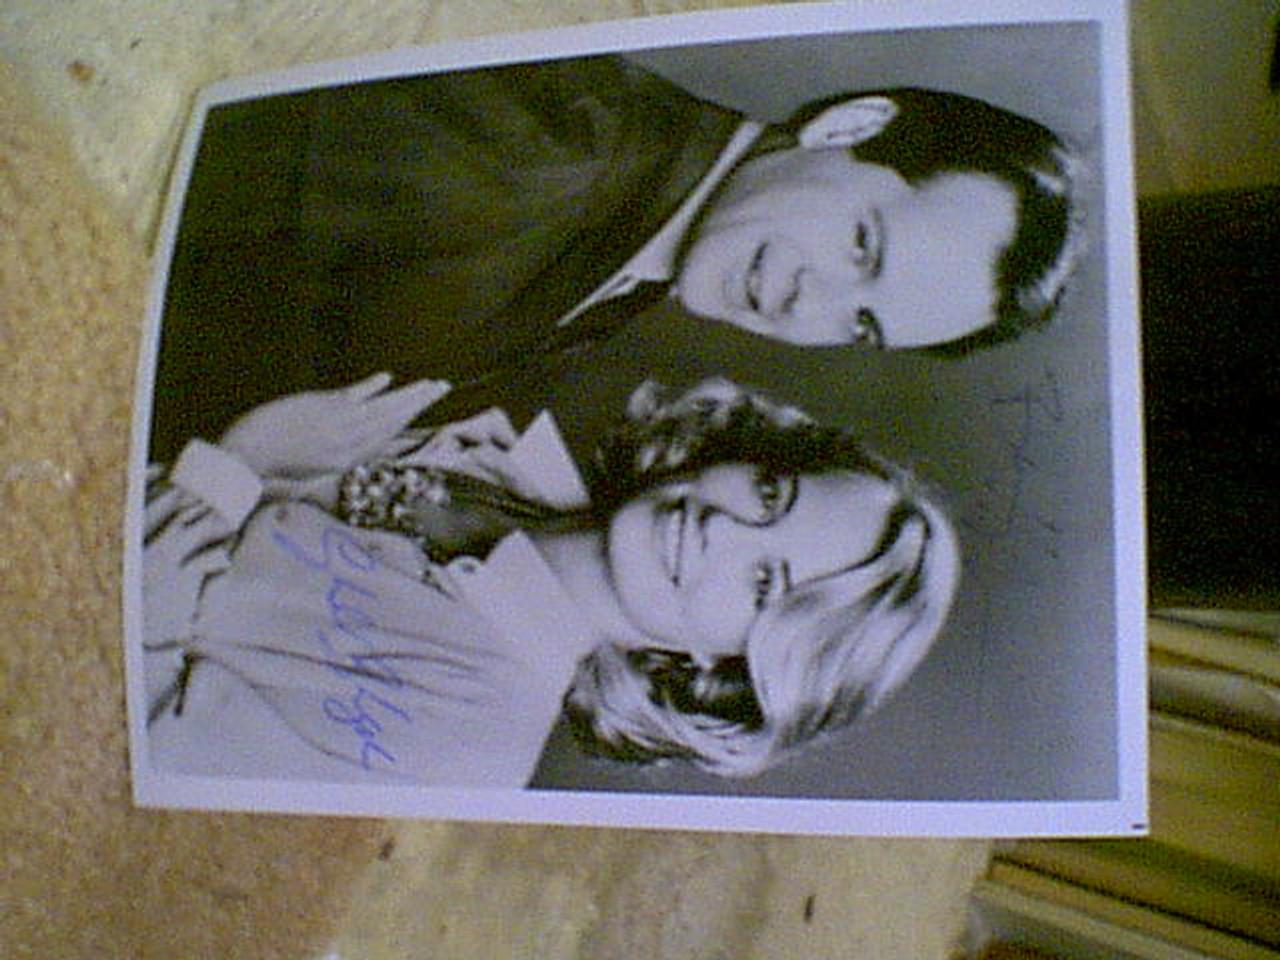 Willis, Bruce Cybill Shepherd Photo Signed Autograph Moonlighting